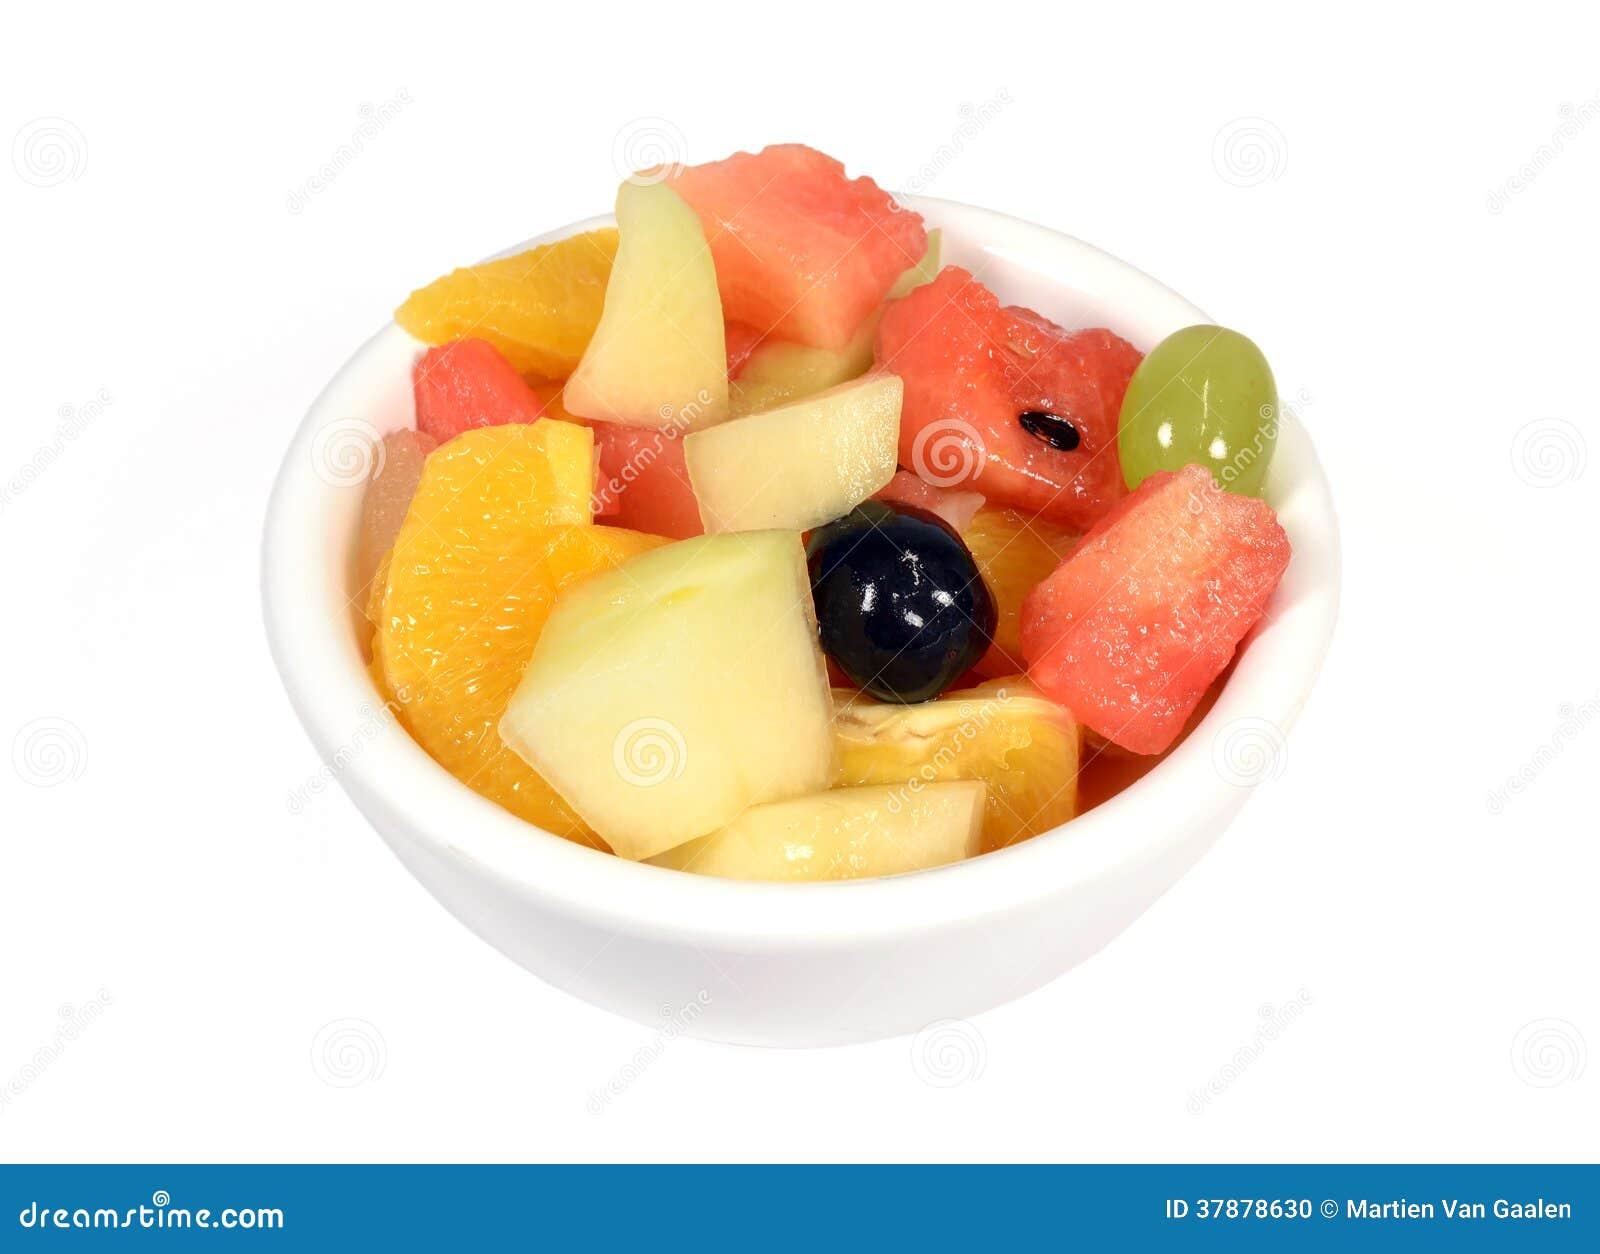 Fruitsalade.